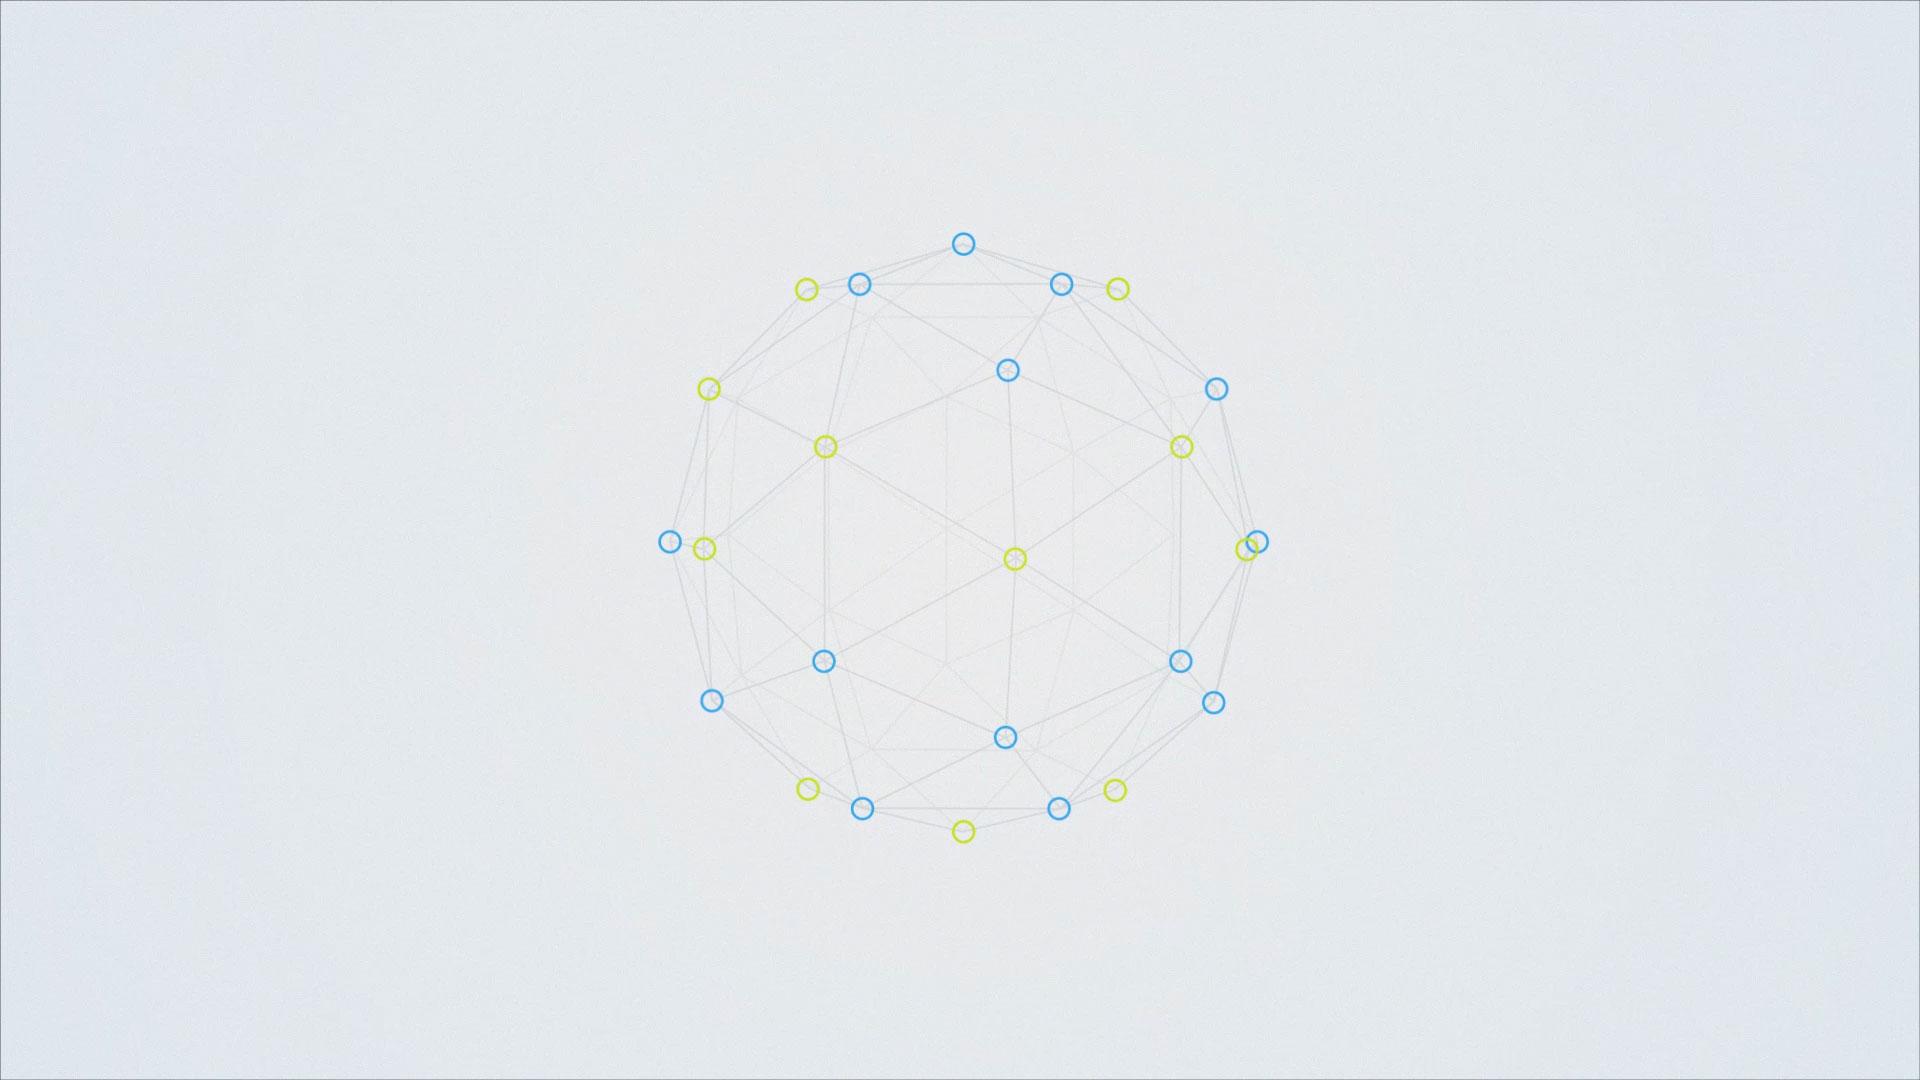 App migration tool - explainer video image